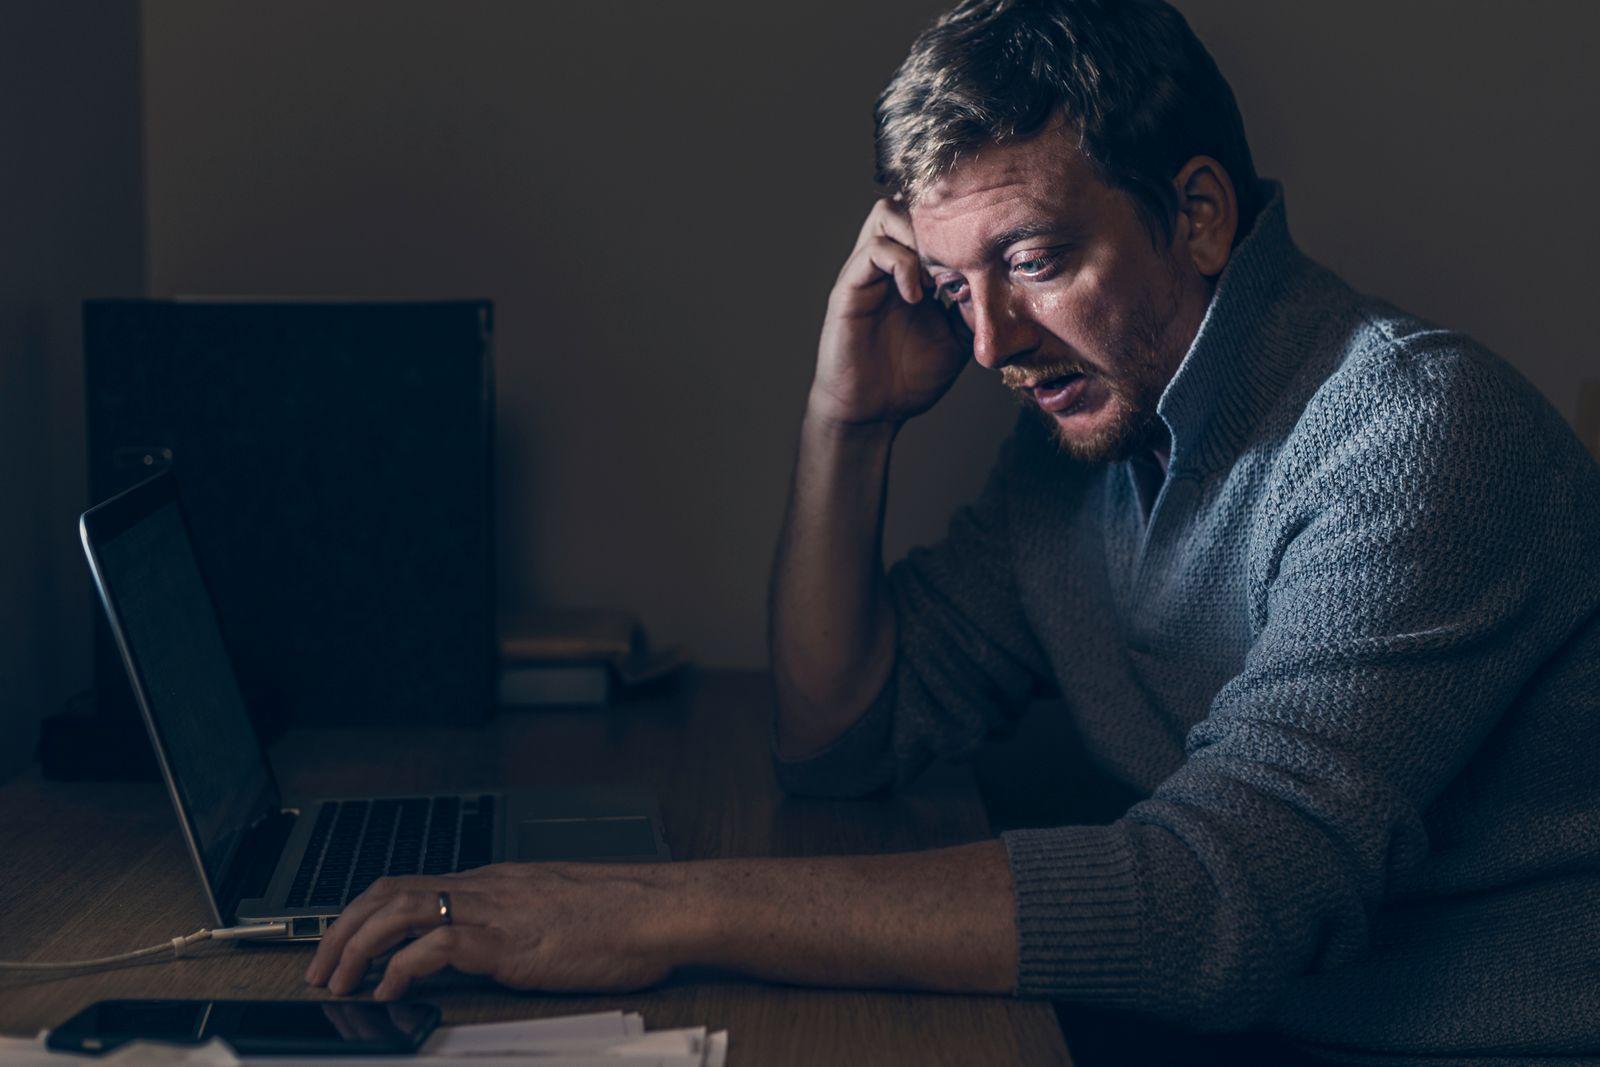 Sad Man at Home Desk